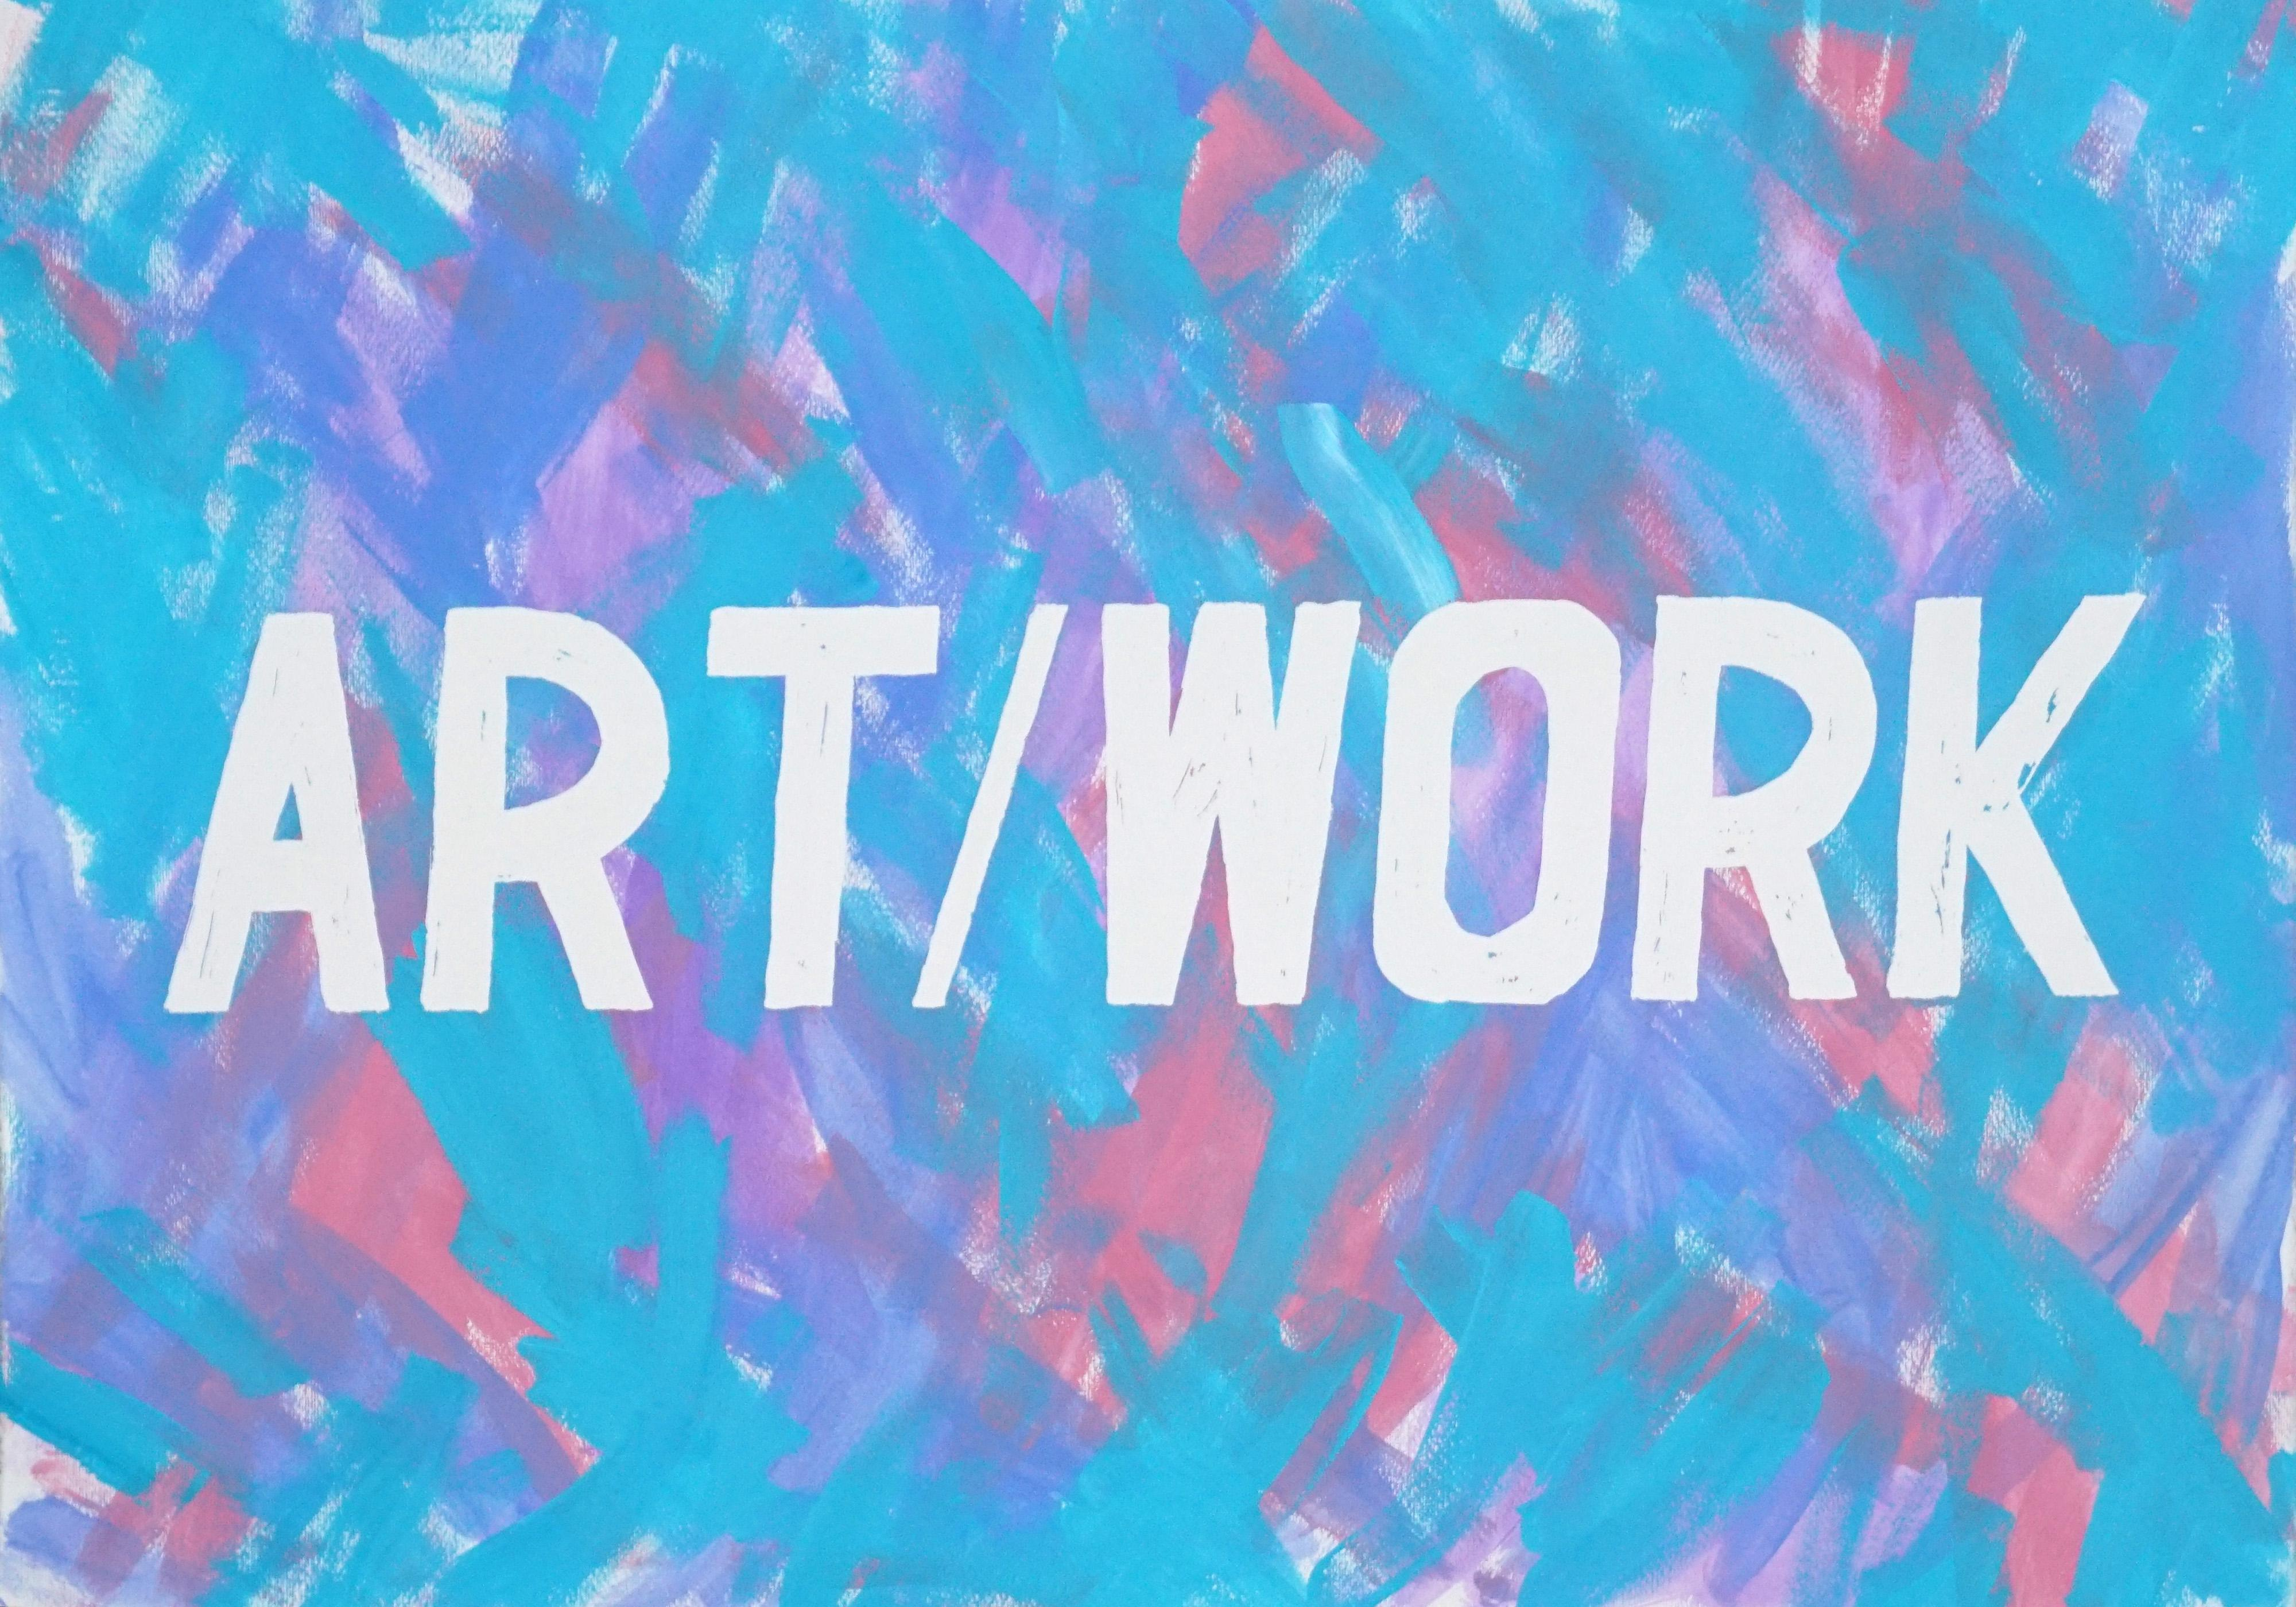 Art - Work, Word Art Calligraphy Painting, Acrylic Vivid Background, Cool Tones